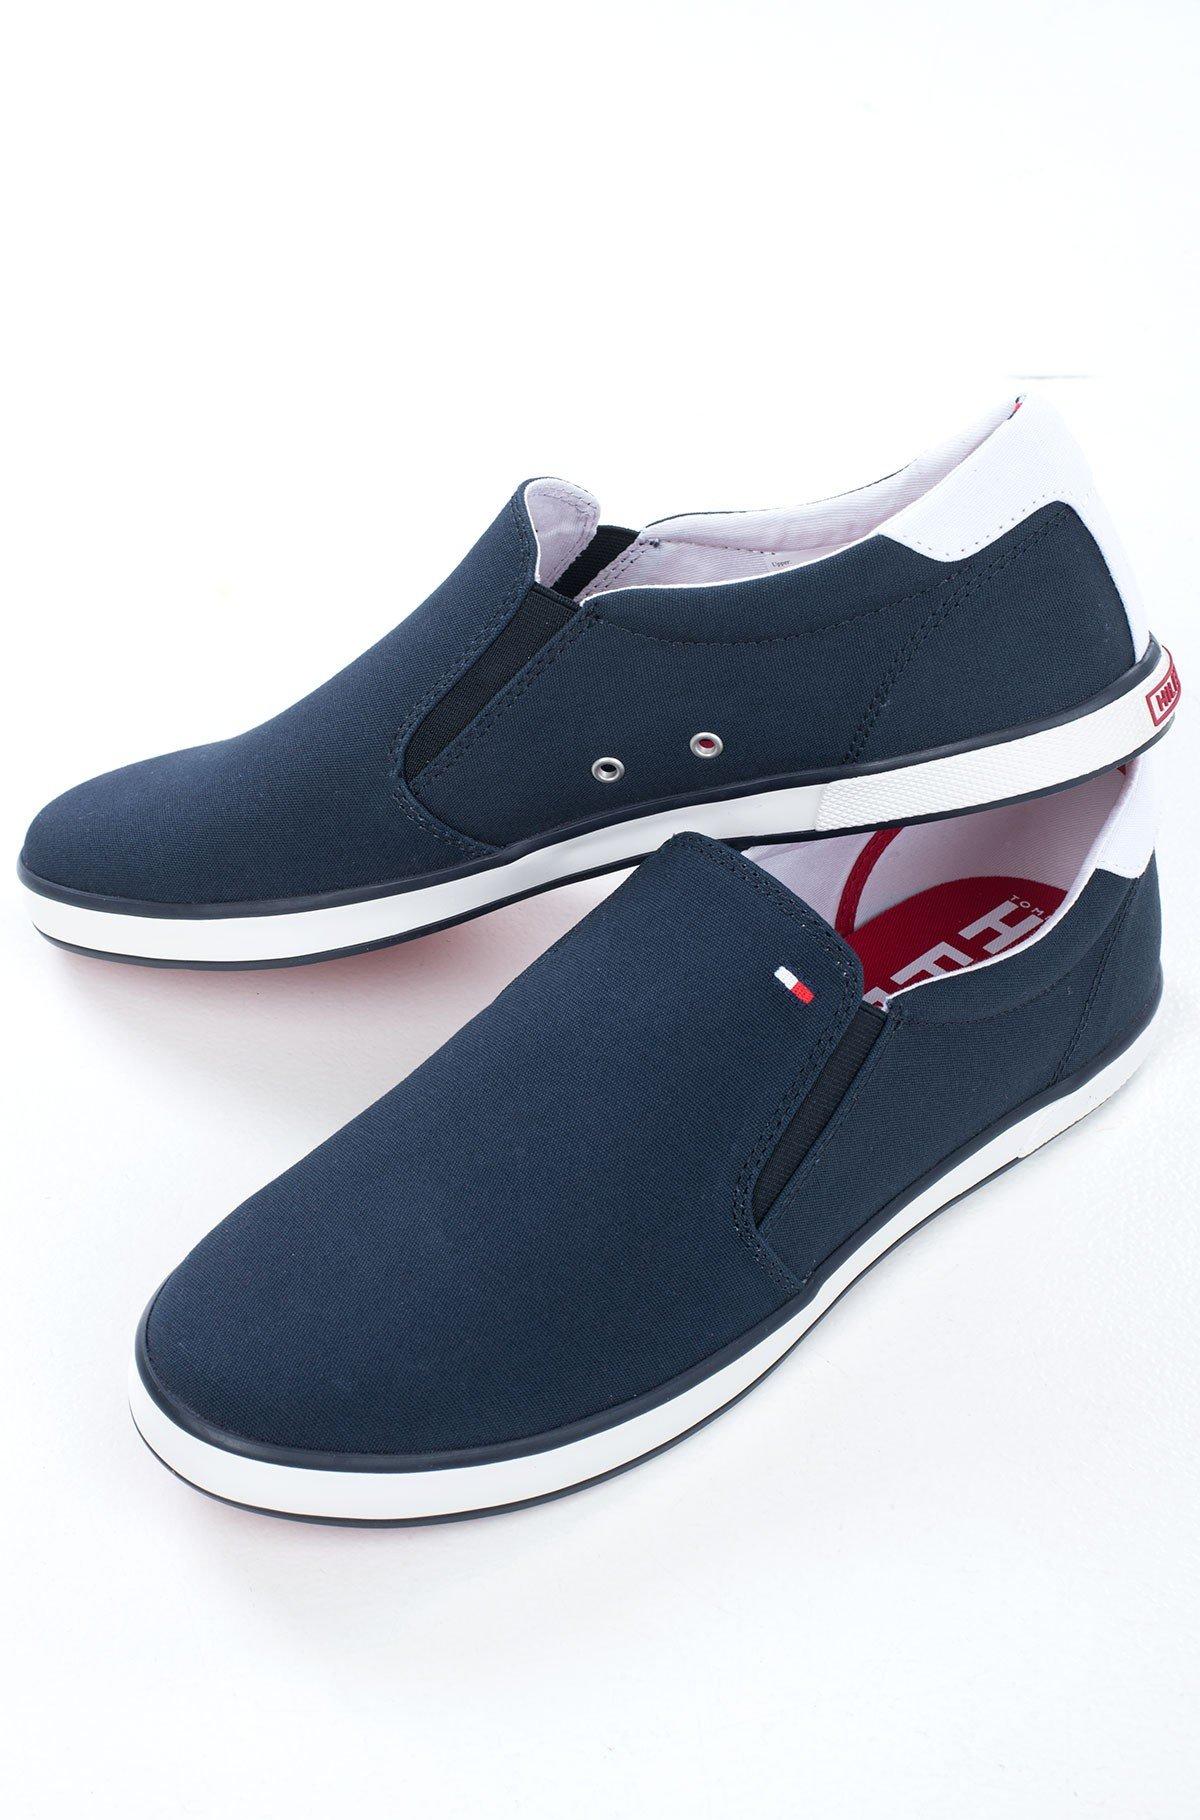 Sneakers Iconic Slip On Sneak-full-3